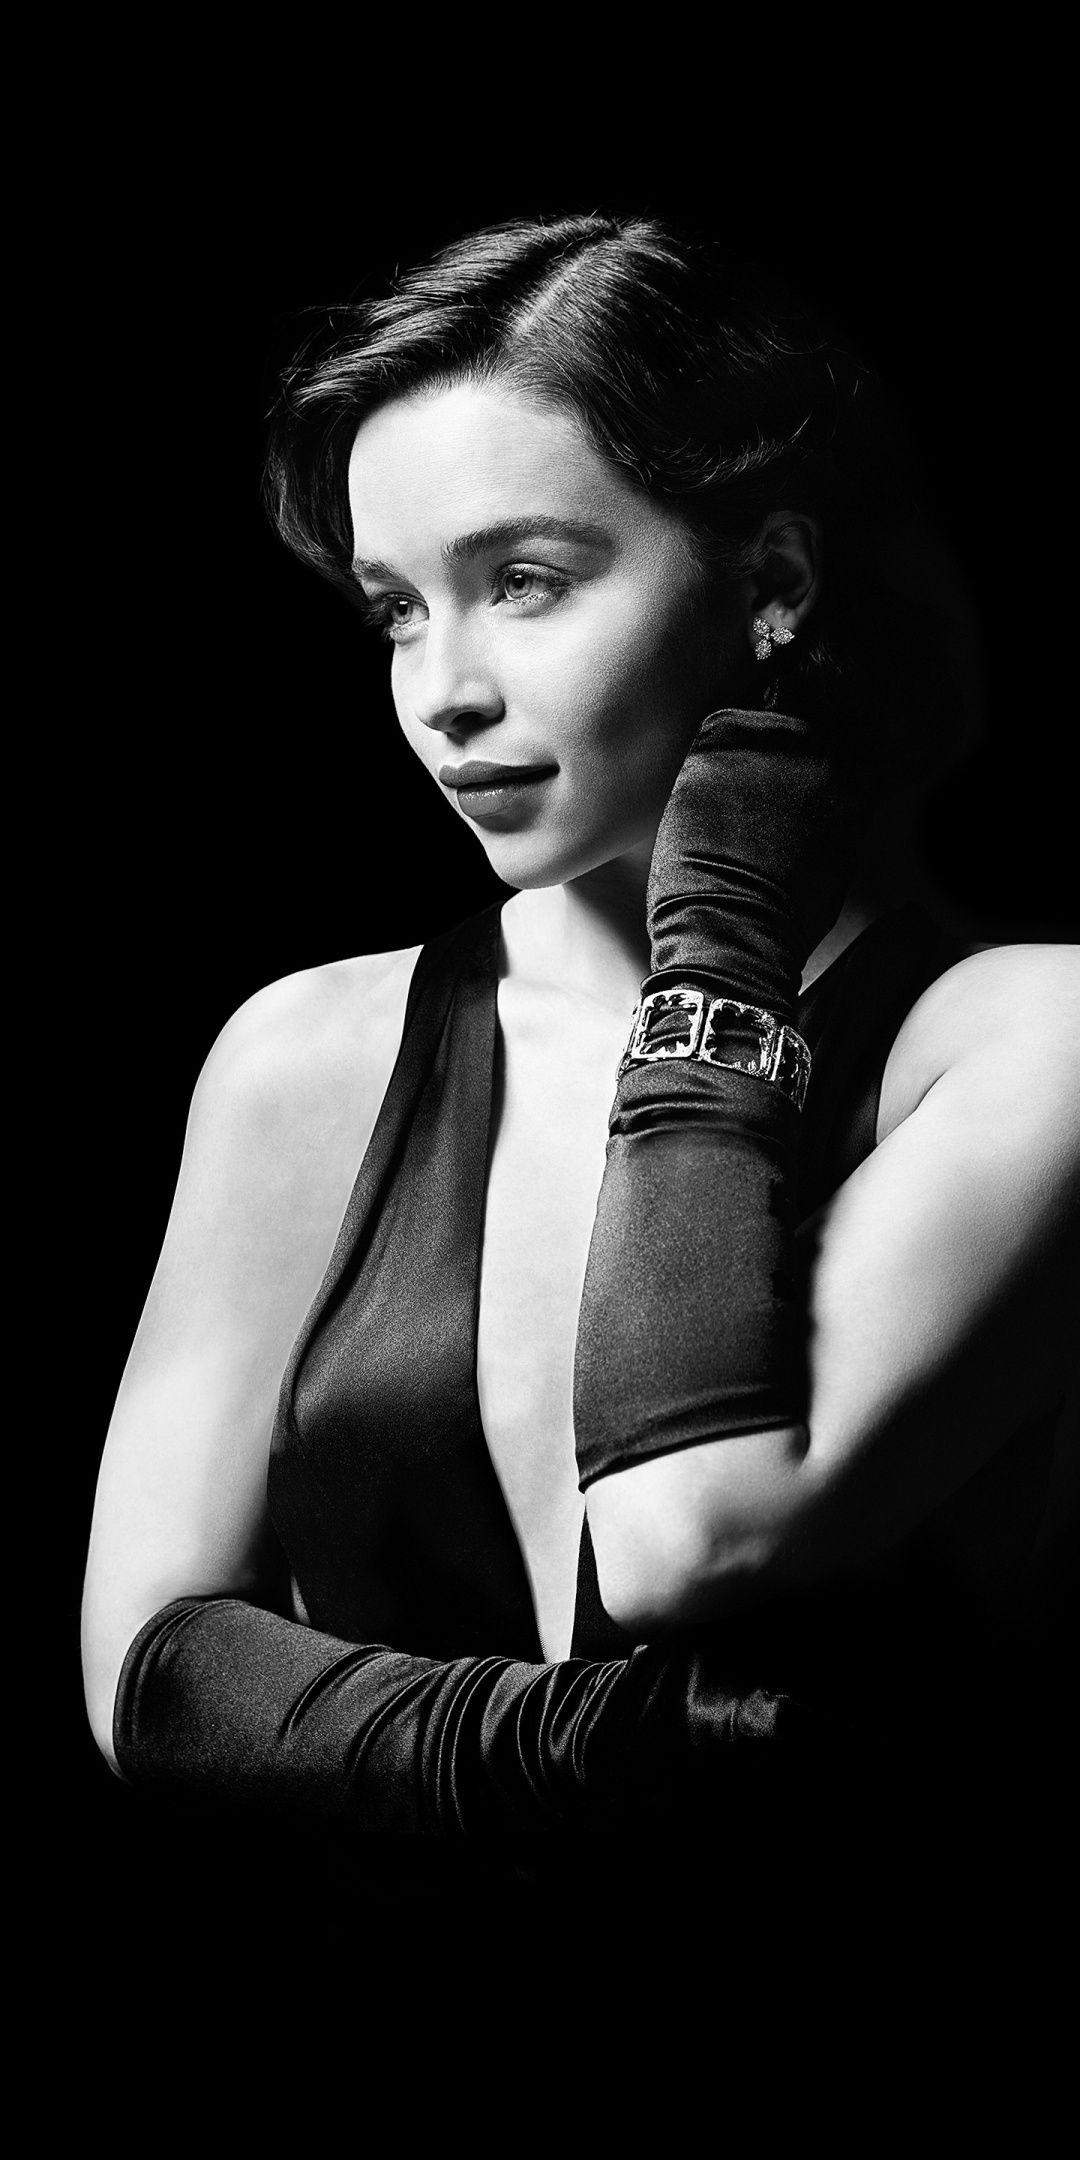 Emilia Clarke BW actress 1080x2160 wallpaper Photoshoot Ideas 1080x2160